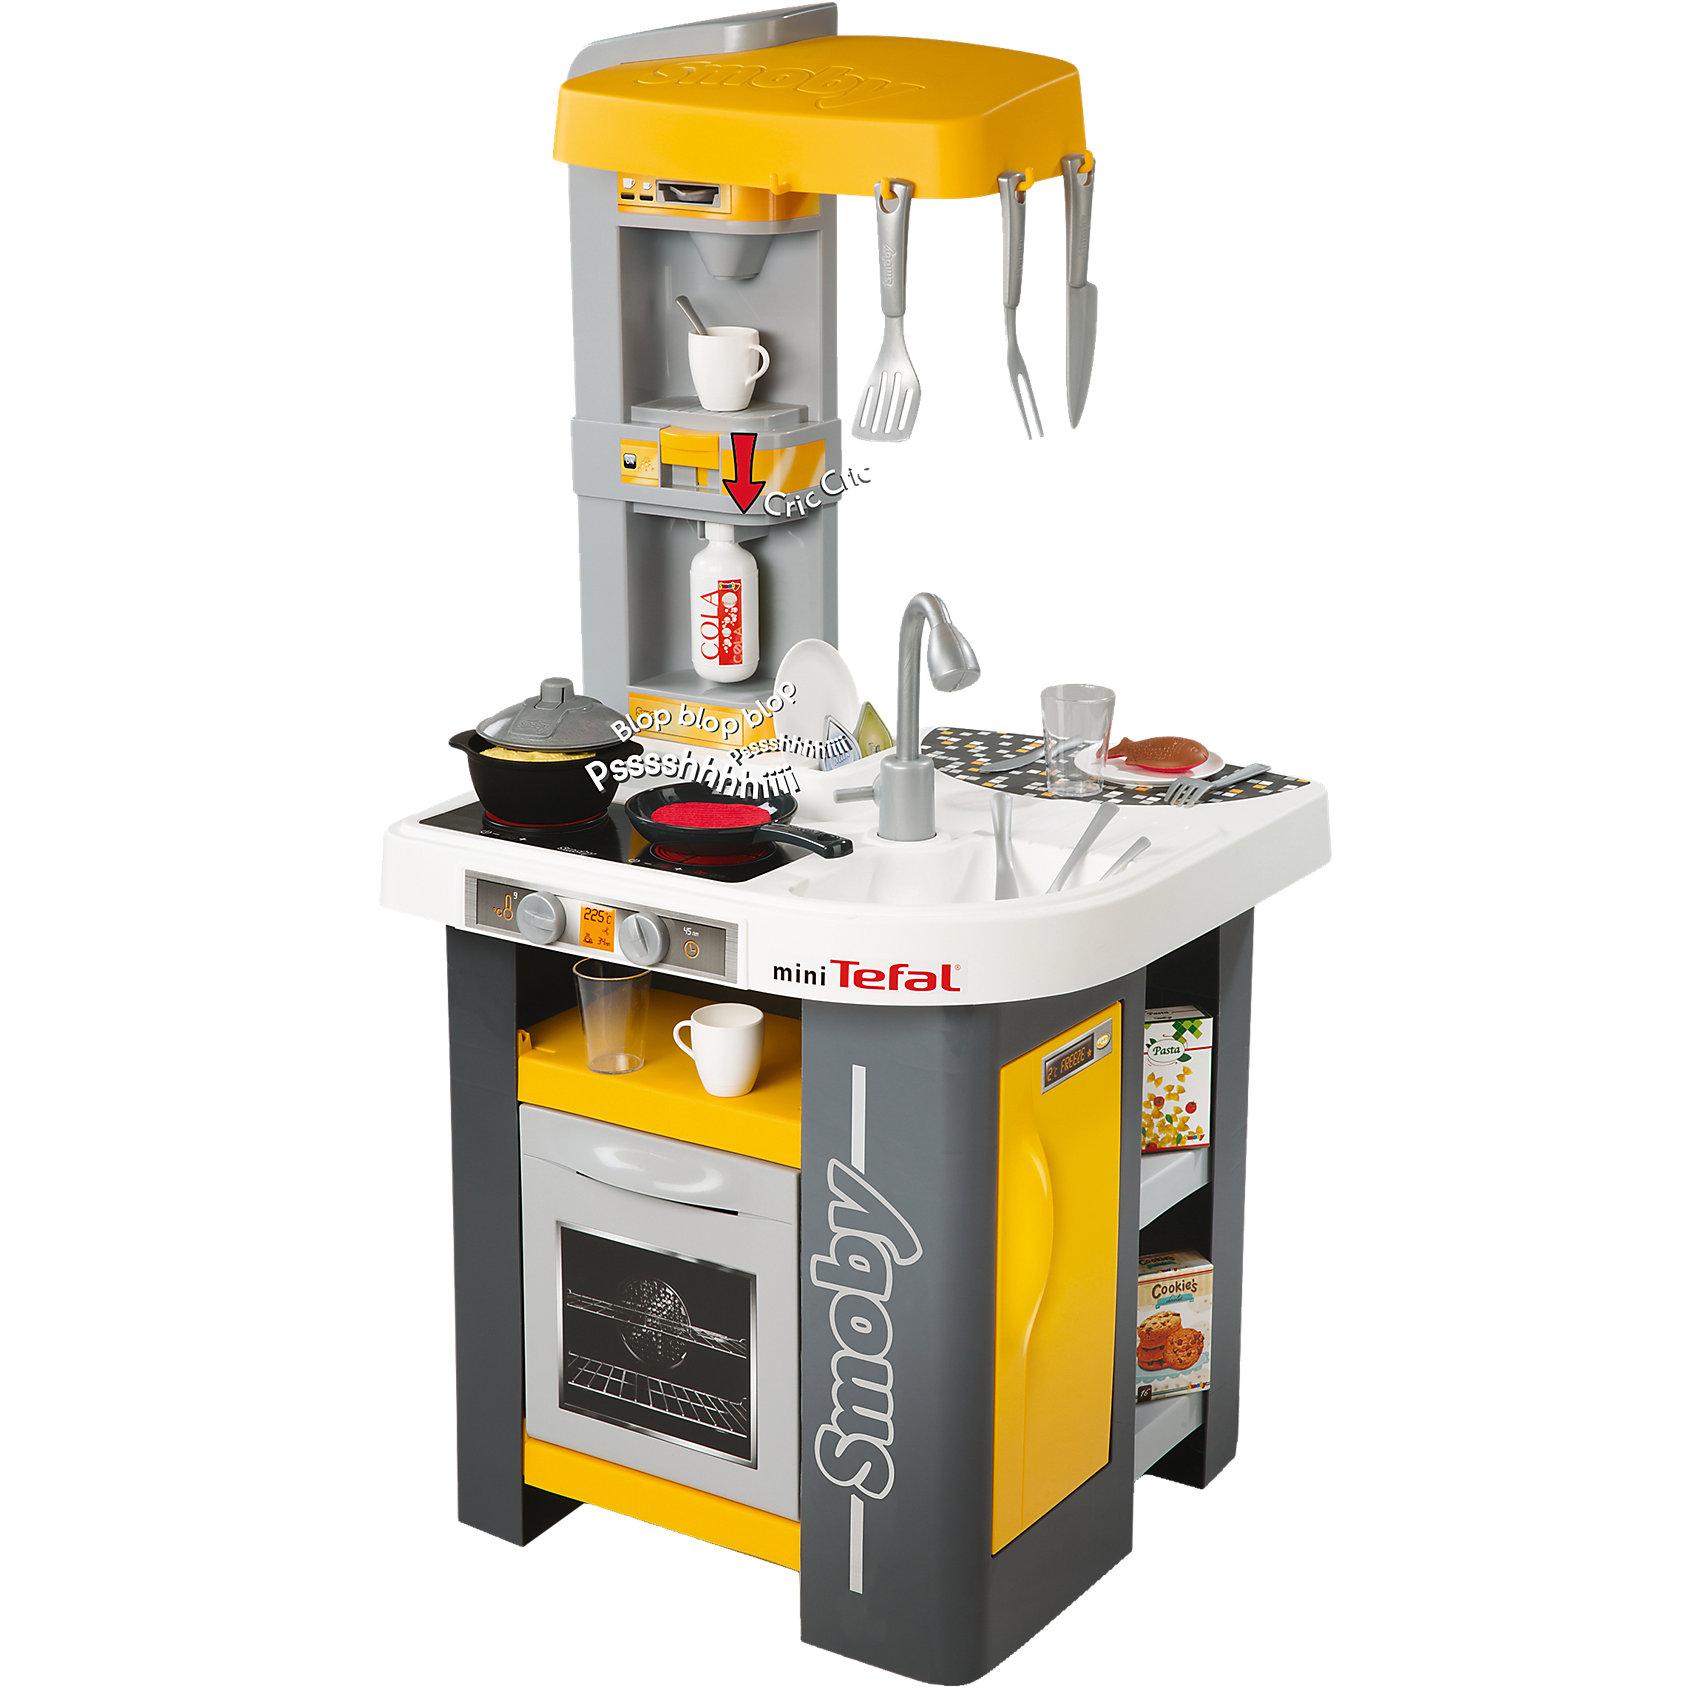 Smoby Кухня электронная Tefal Studio smoby игровой набор кухня tefal studio xxl